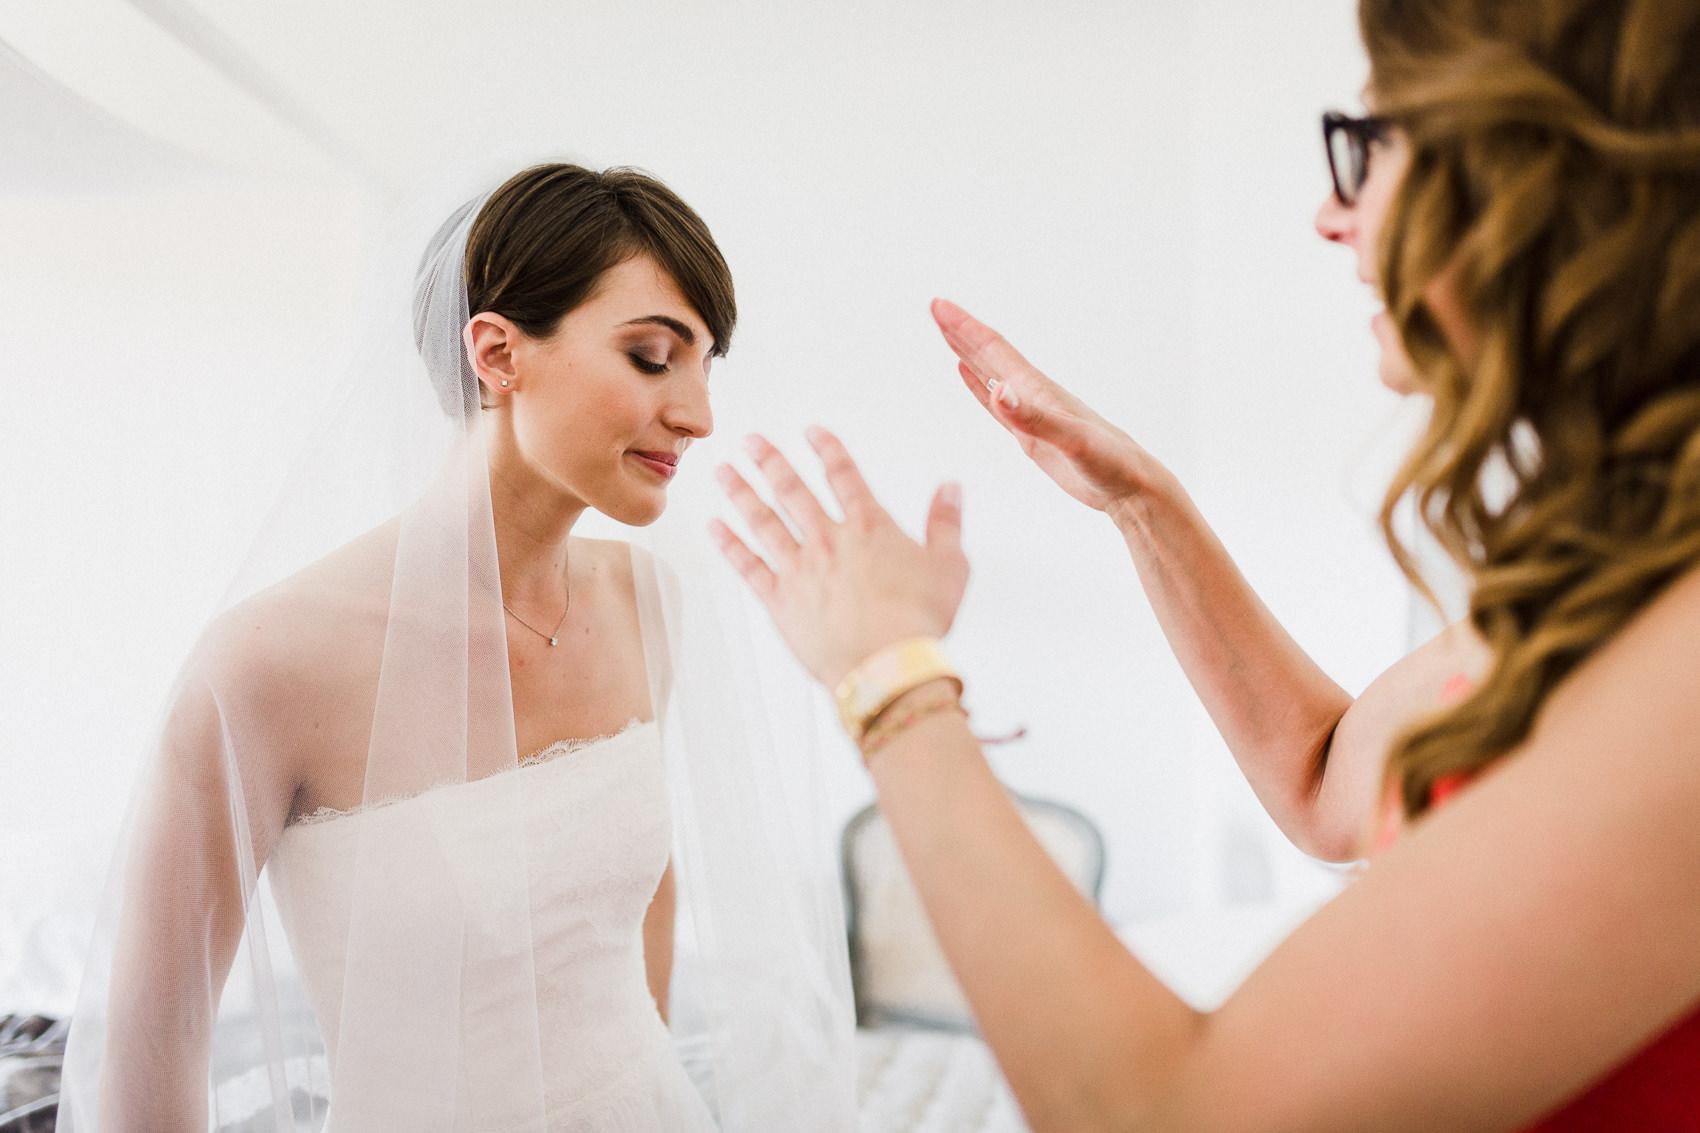 mariage-charlotte-et-joel-trendzphotography-036